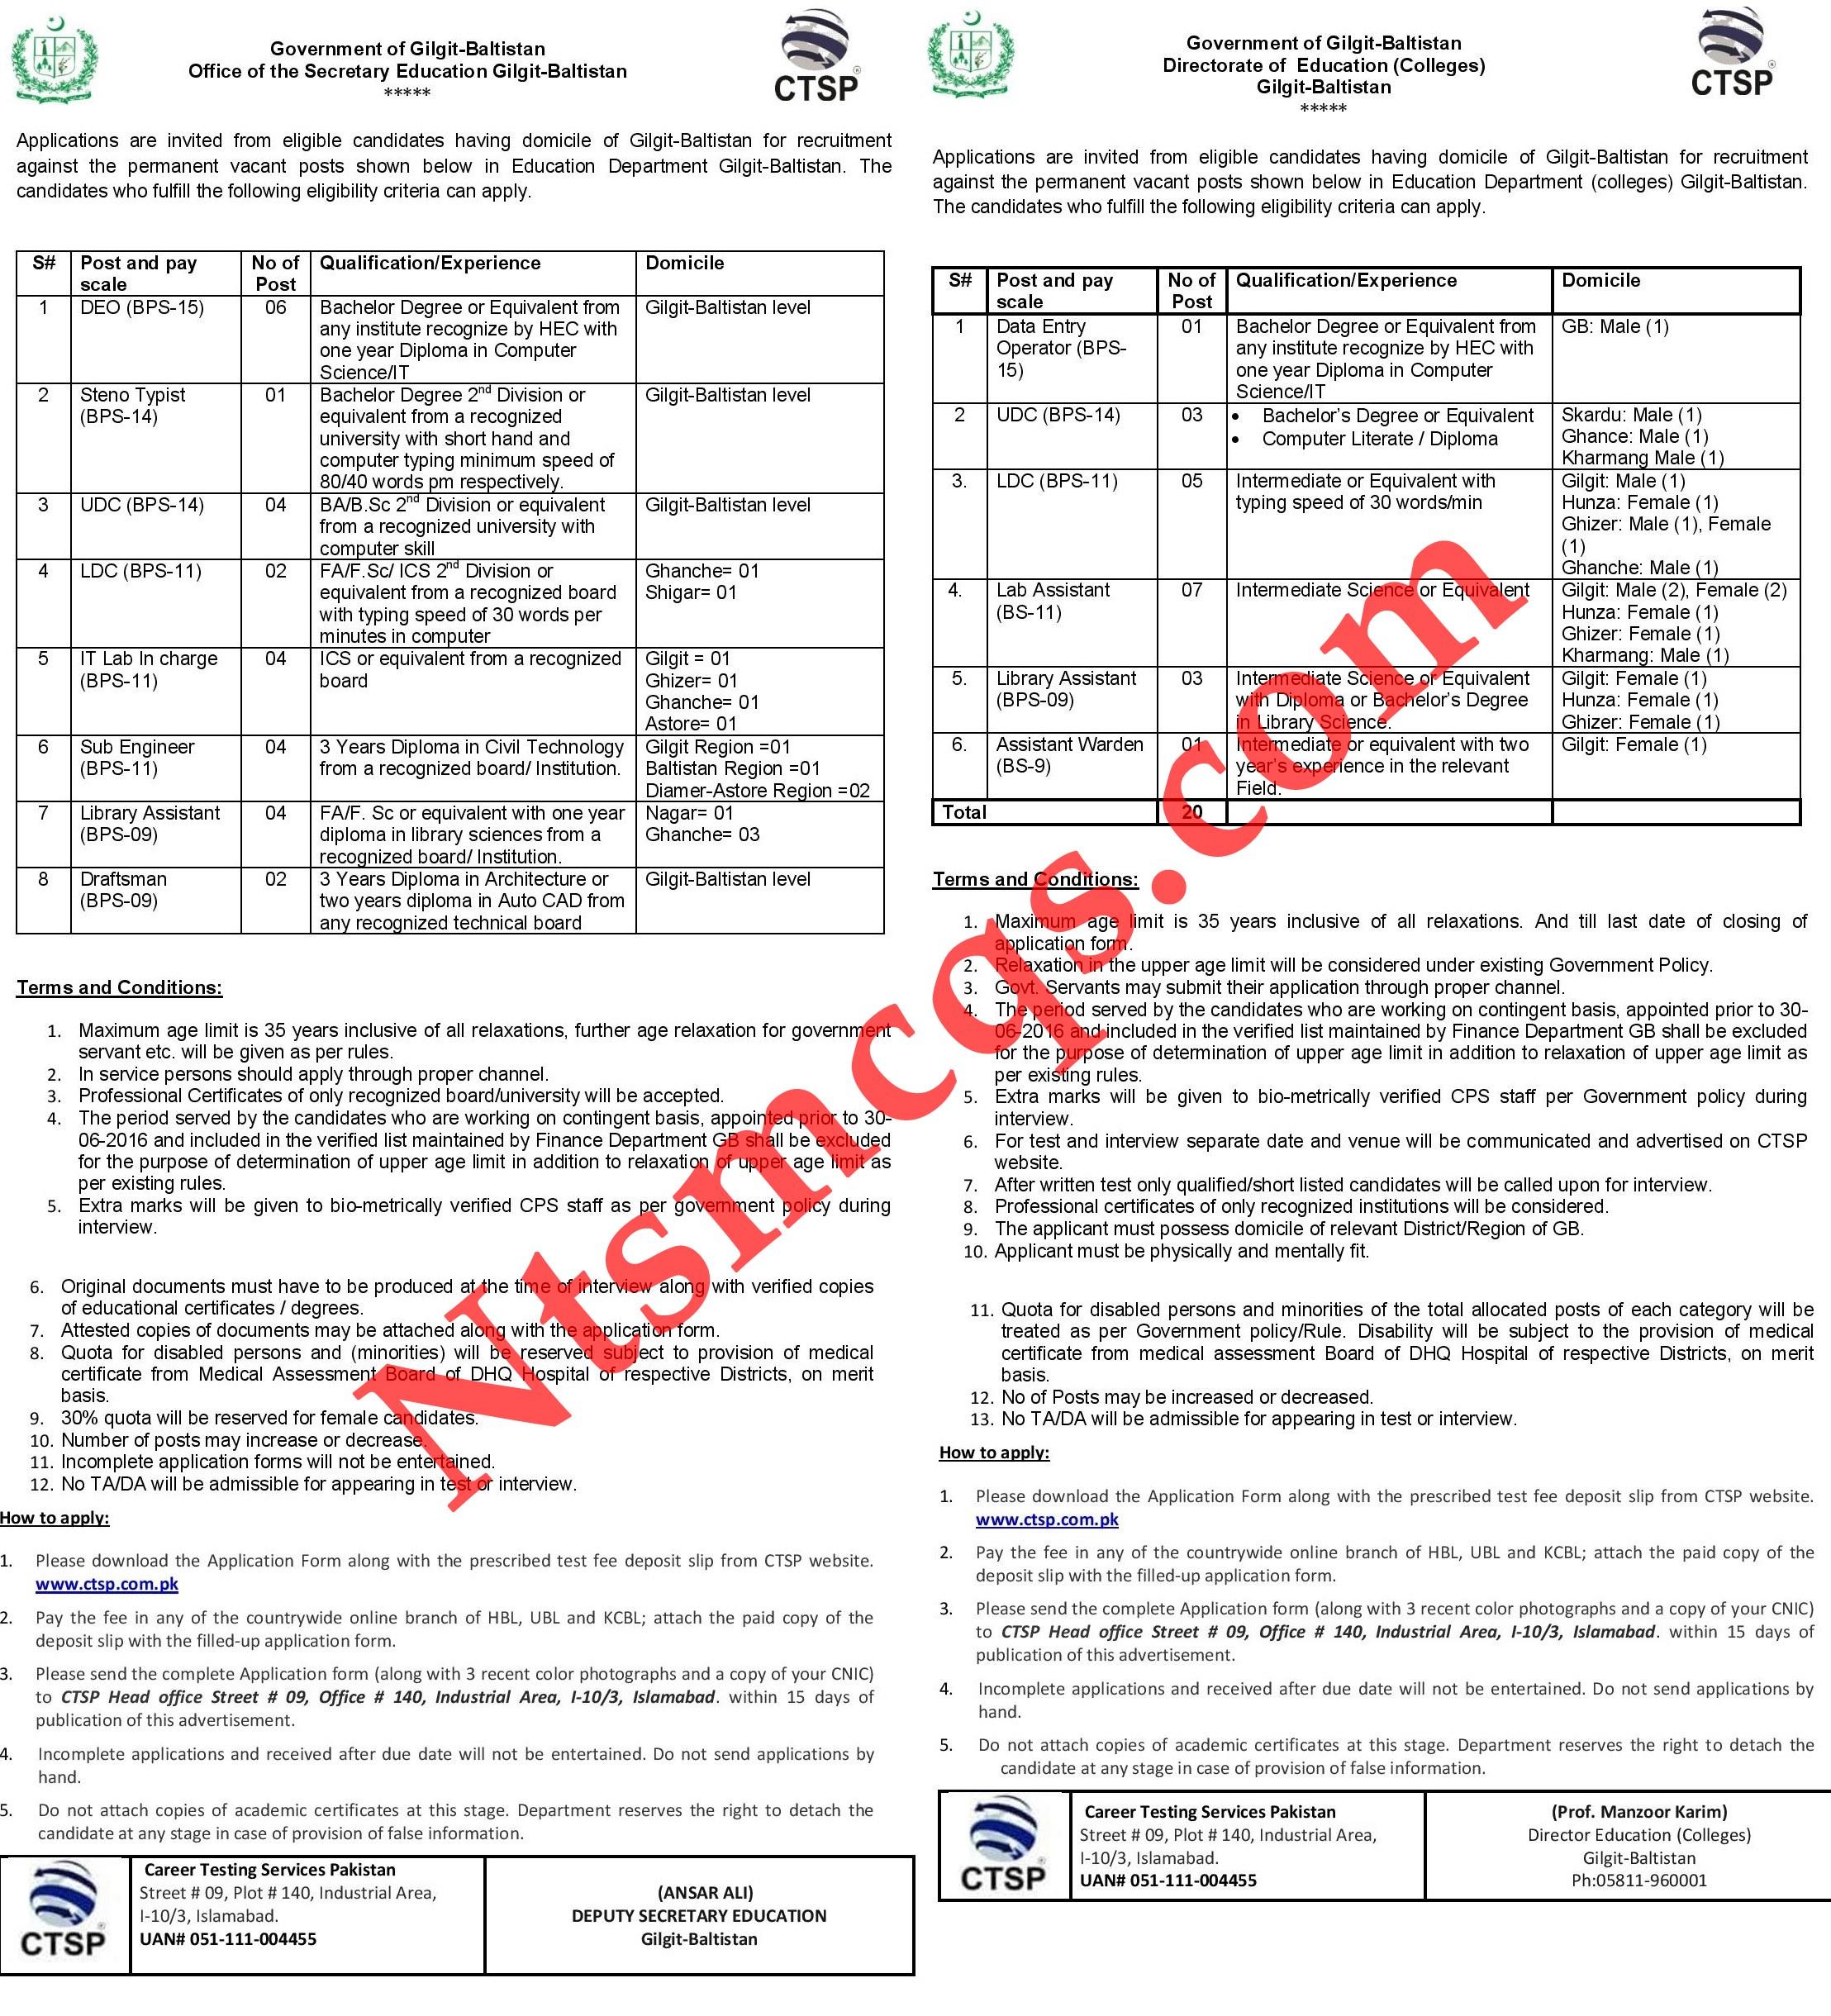 Directorate of Education College Admin Staff Gilgit Baltistan Jobs 2020 CTSP Application Form